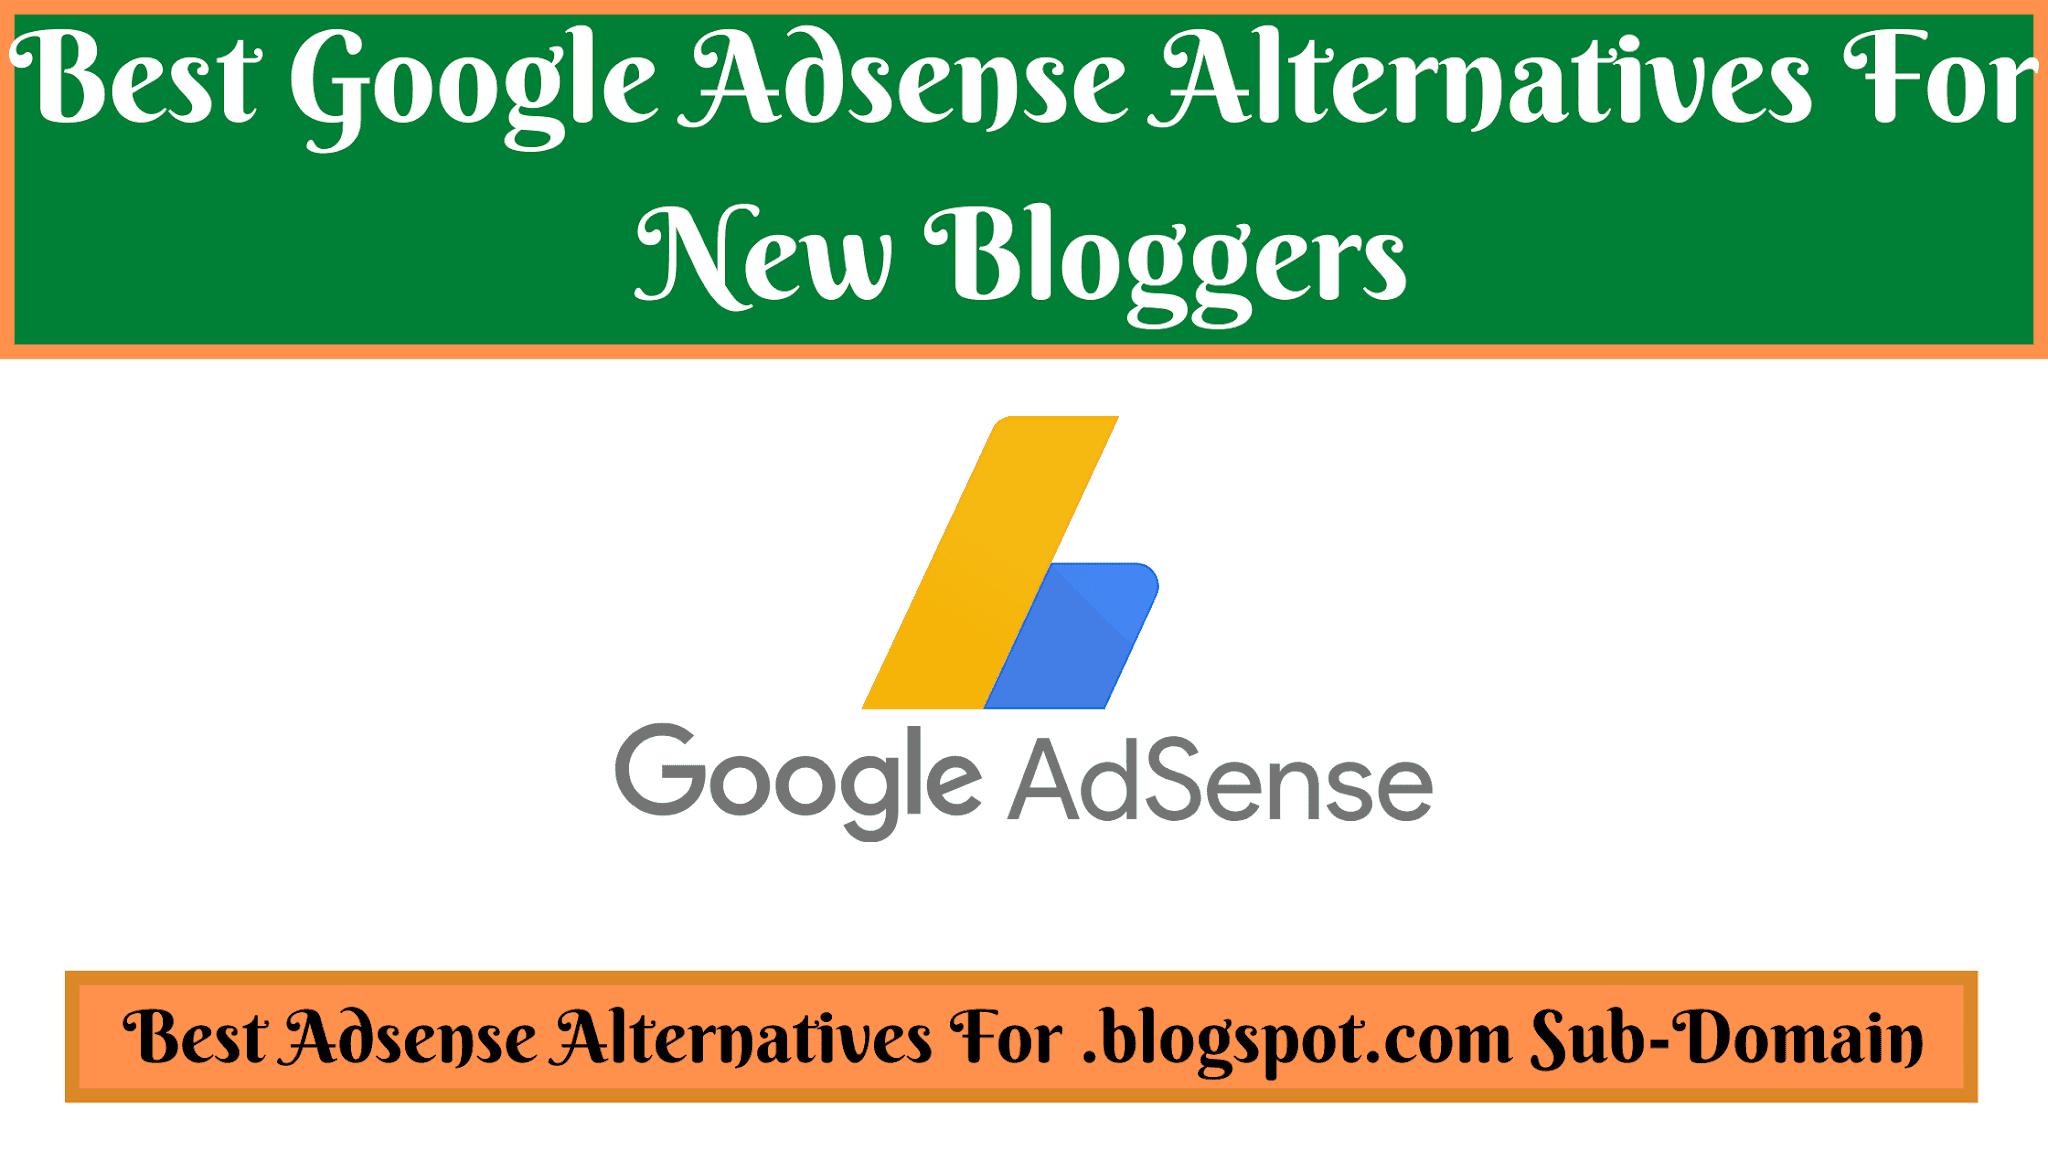 [BEST] Top 5 Best Adsense Alternatives For New Blogspot Bloggers 2020 [Fast Approval]